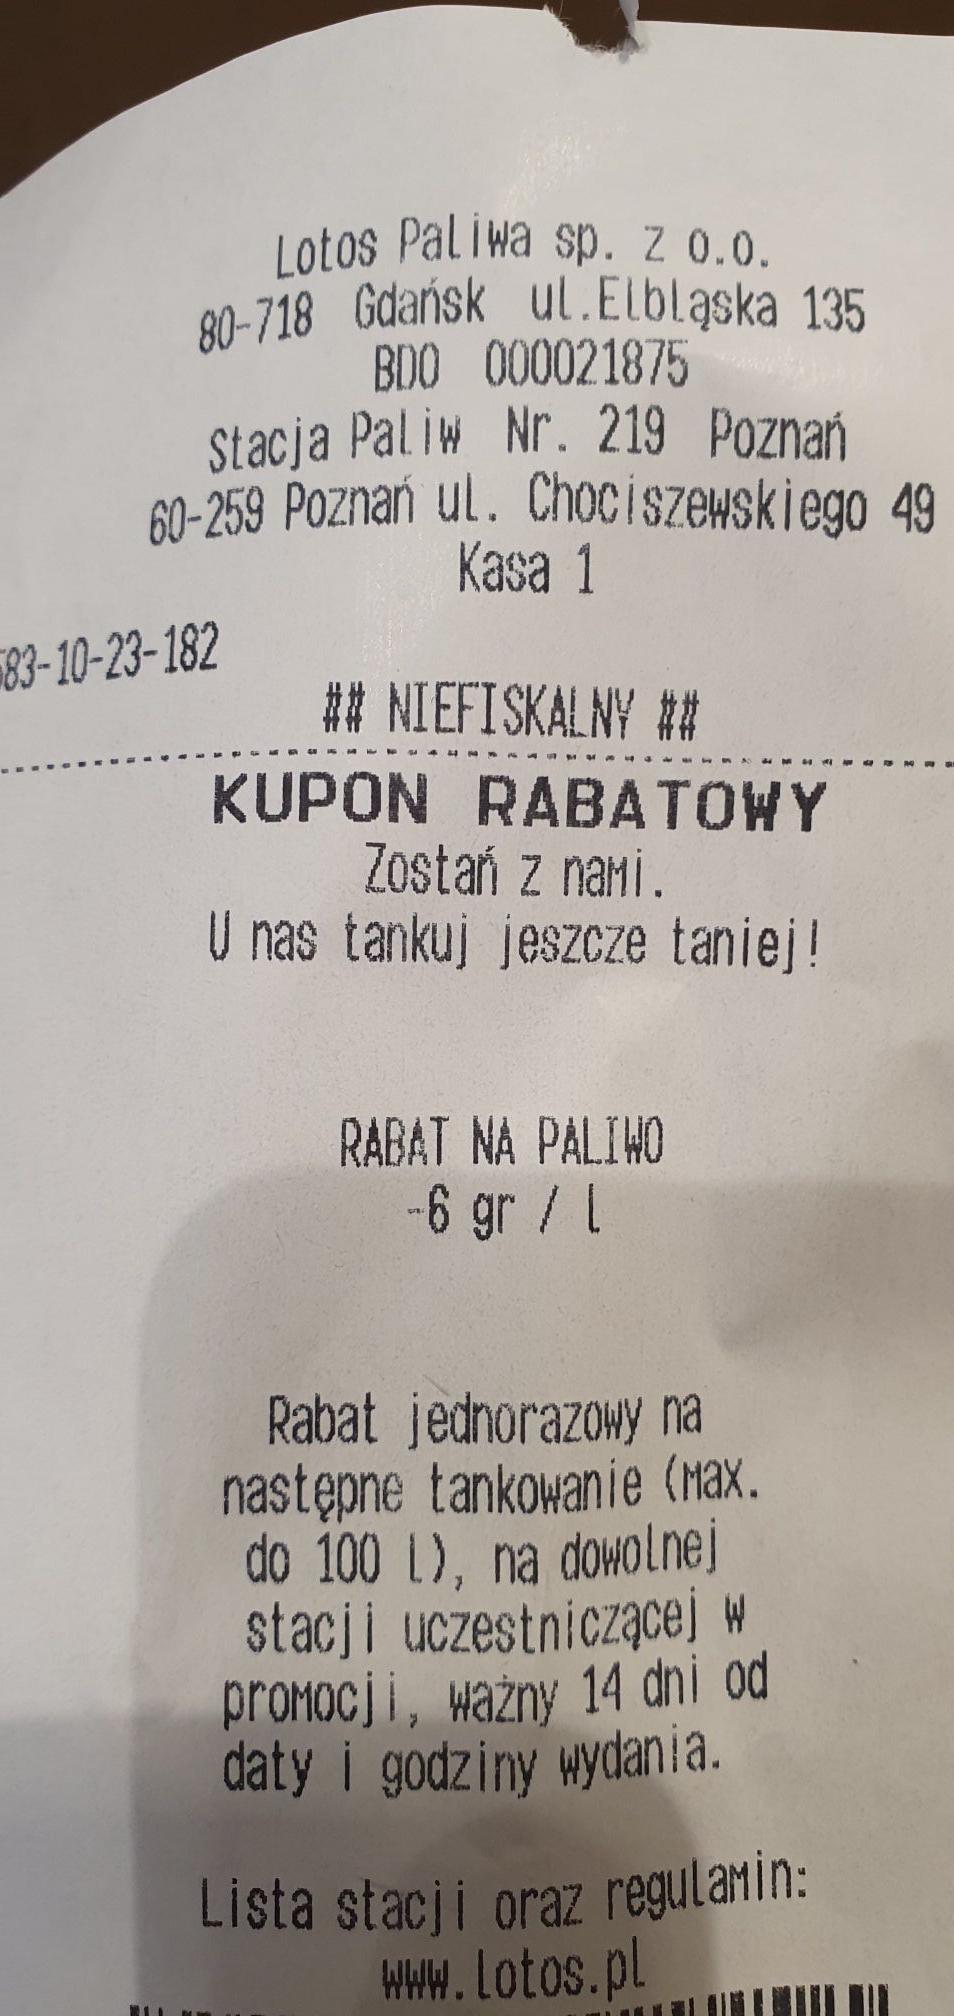 Kod rabatowy -6gr/l